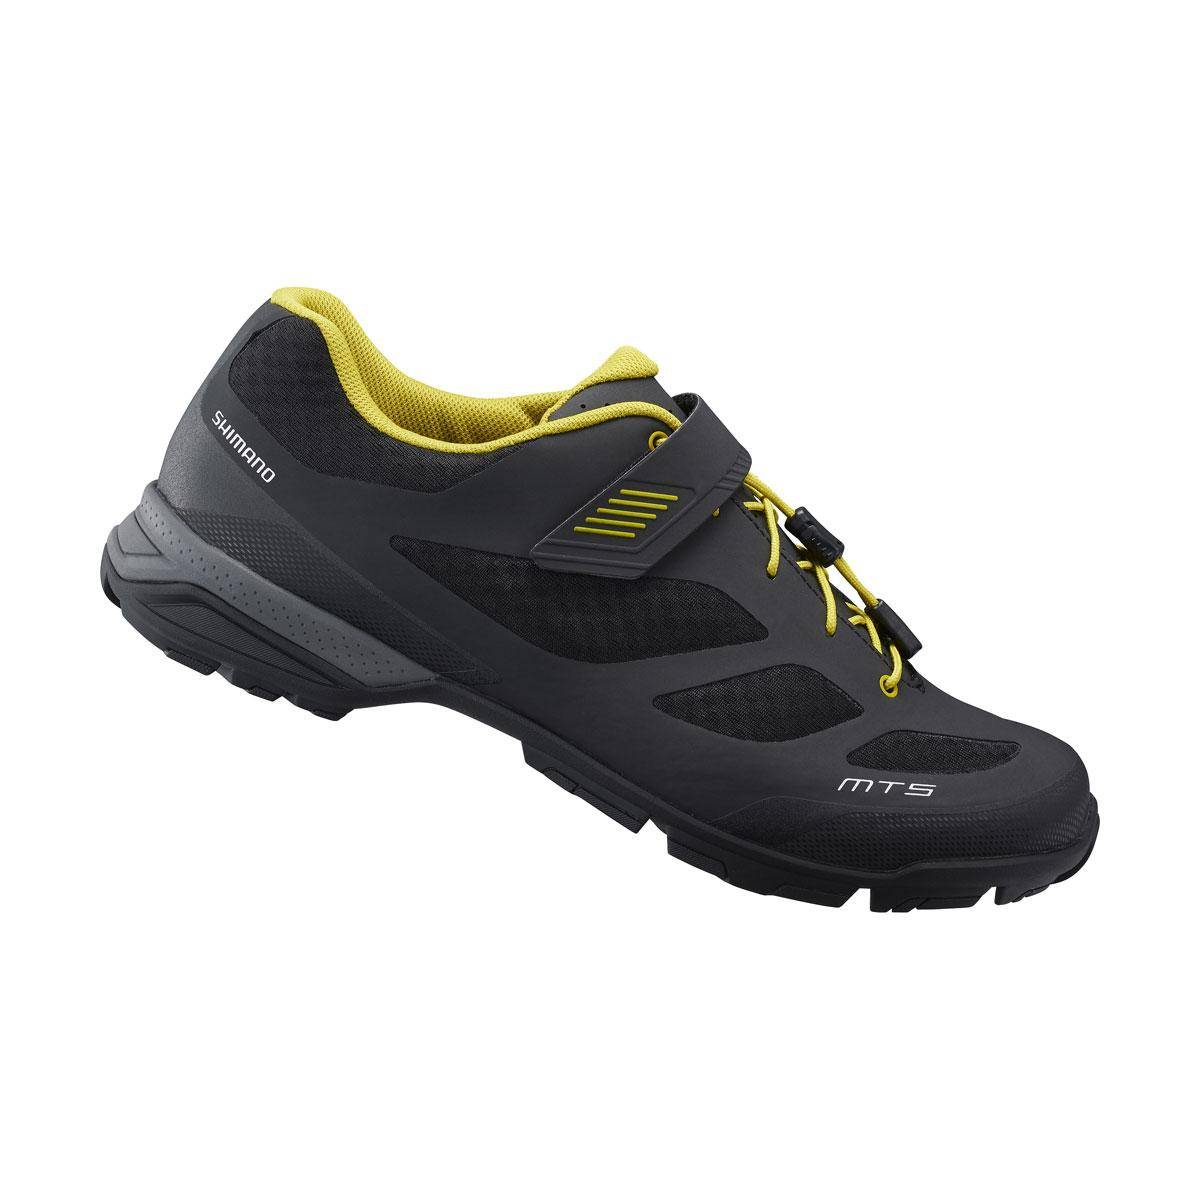 Shimano turistická obuv SH-MT501ML, černá, 39